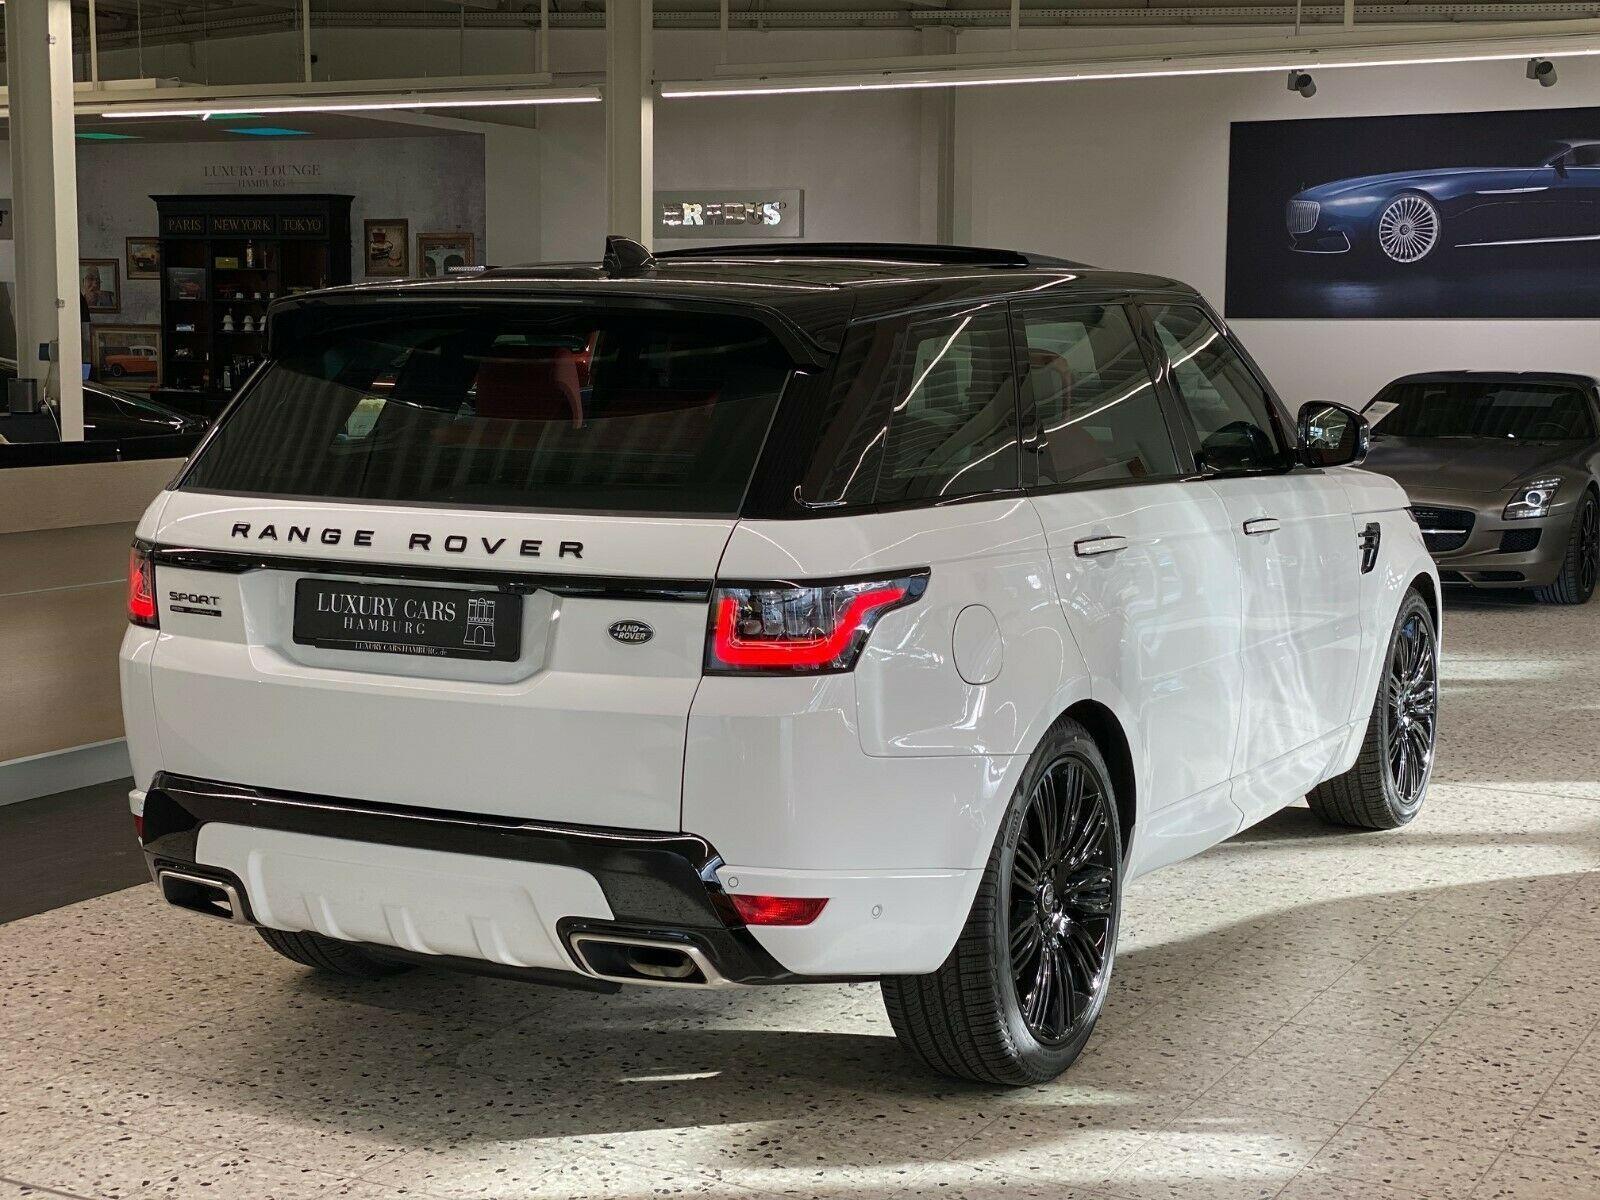 Land Rover Range Rover Sport Luxury Cars Hamburg Germany For Sale On Luxurypulse In 2020 Range Rover Sport Range Rover Land Rover